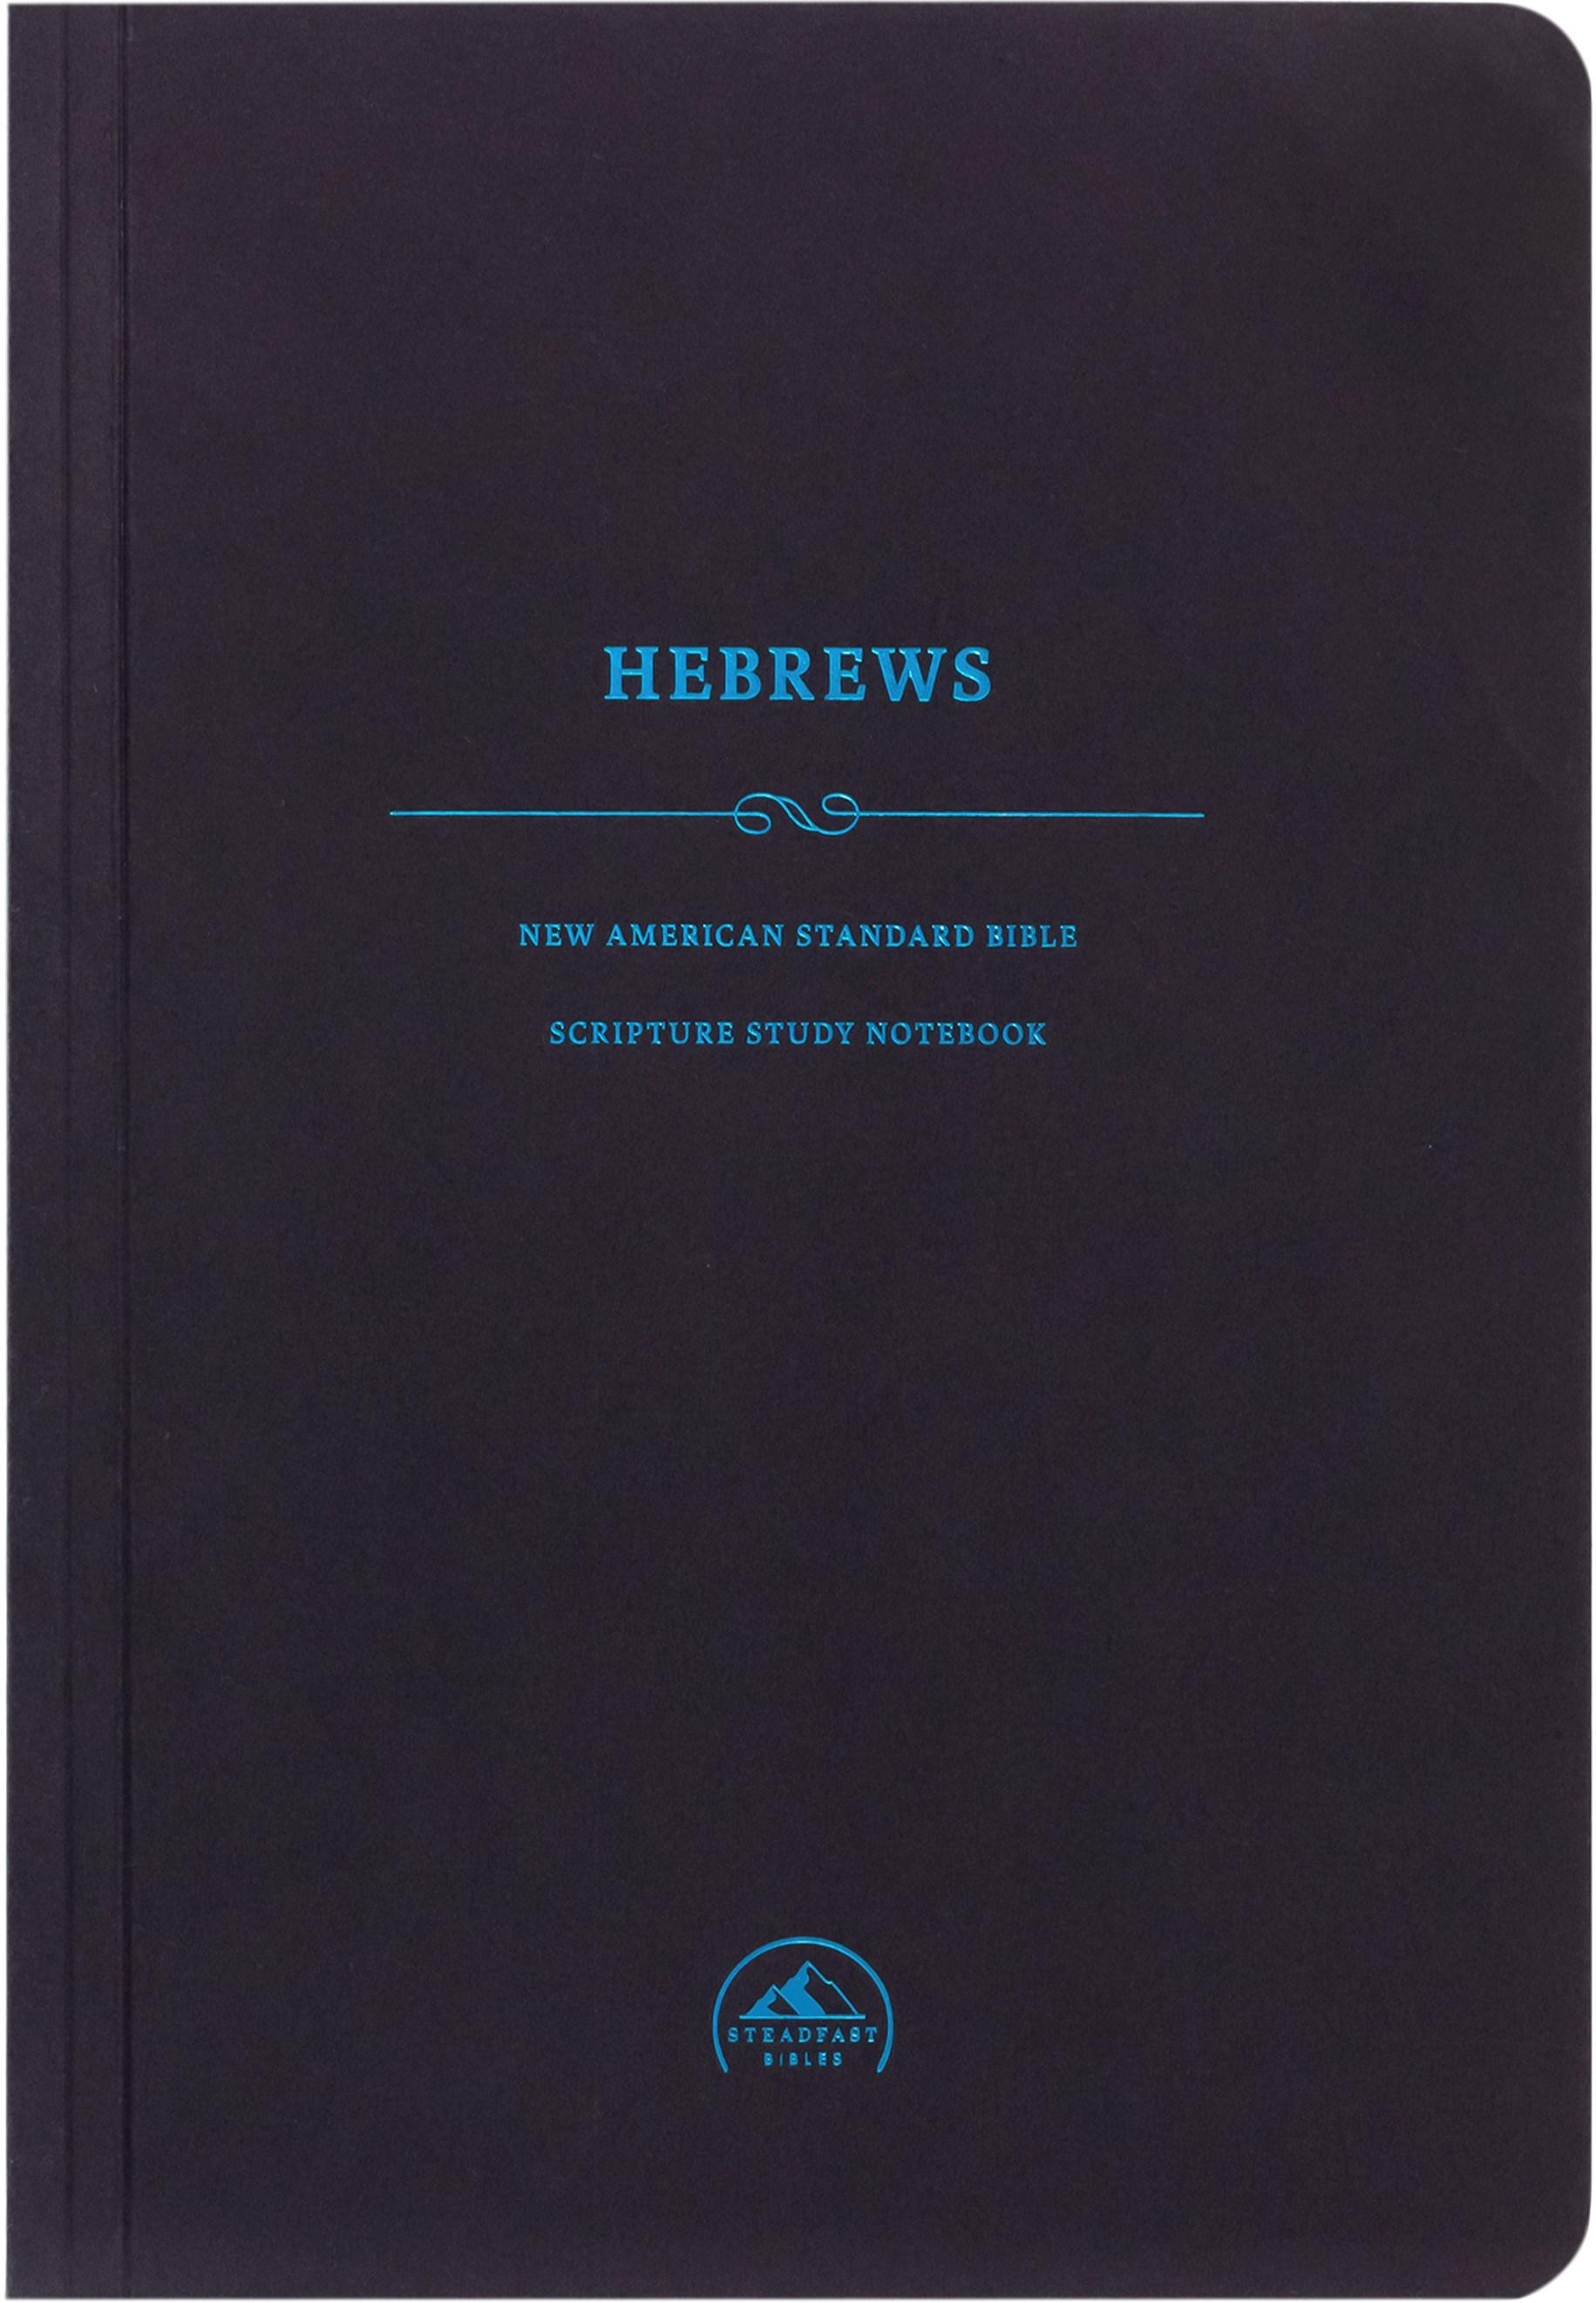 NASB Scripture Study Notebook: Hebrews